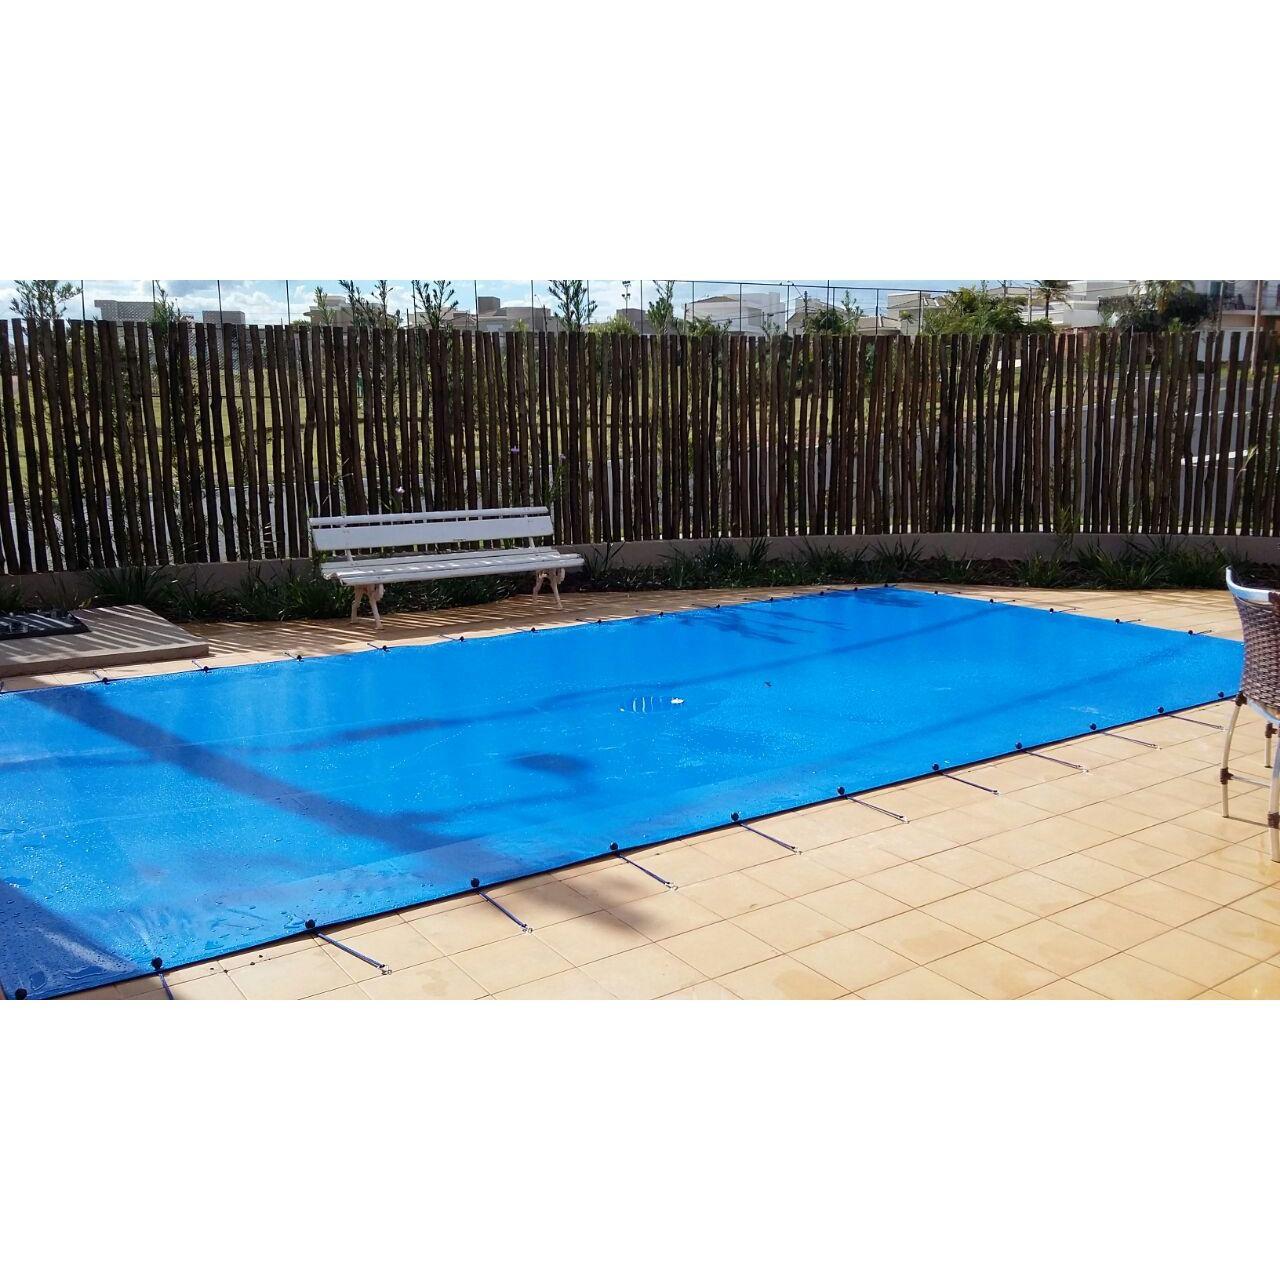 Lona Polietileno Azul 300 Micras - 11x5